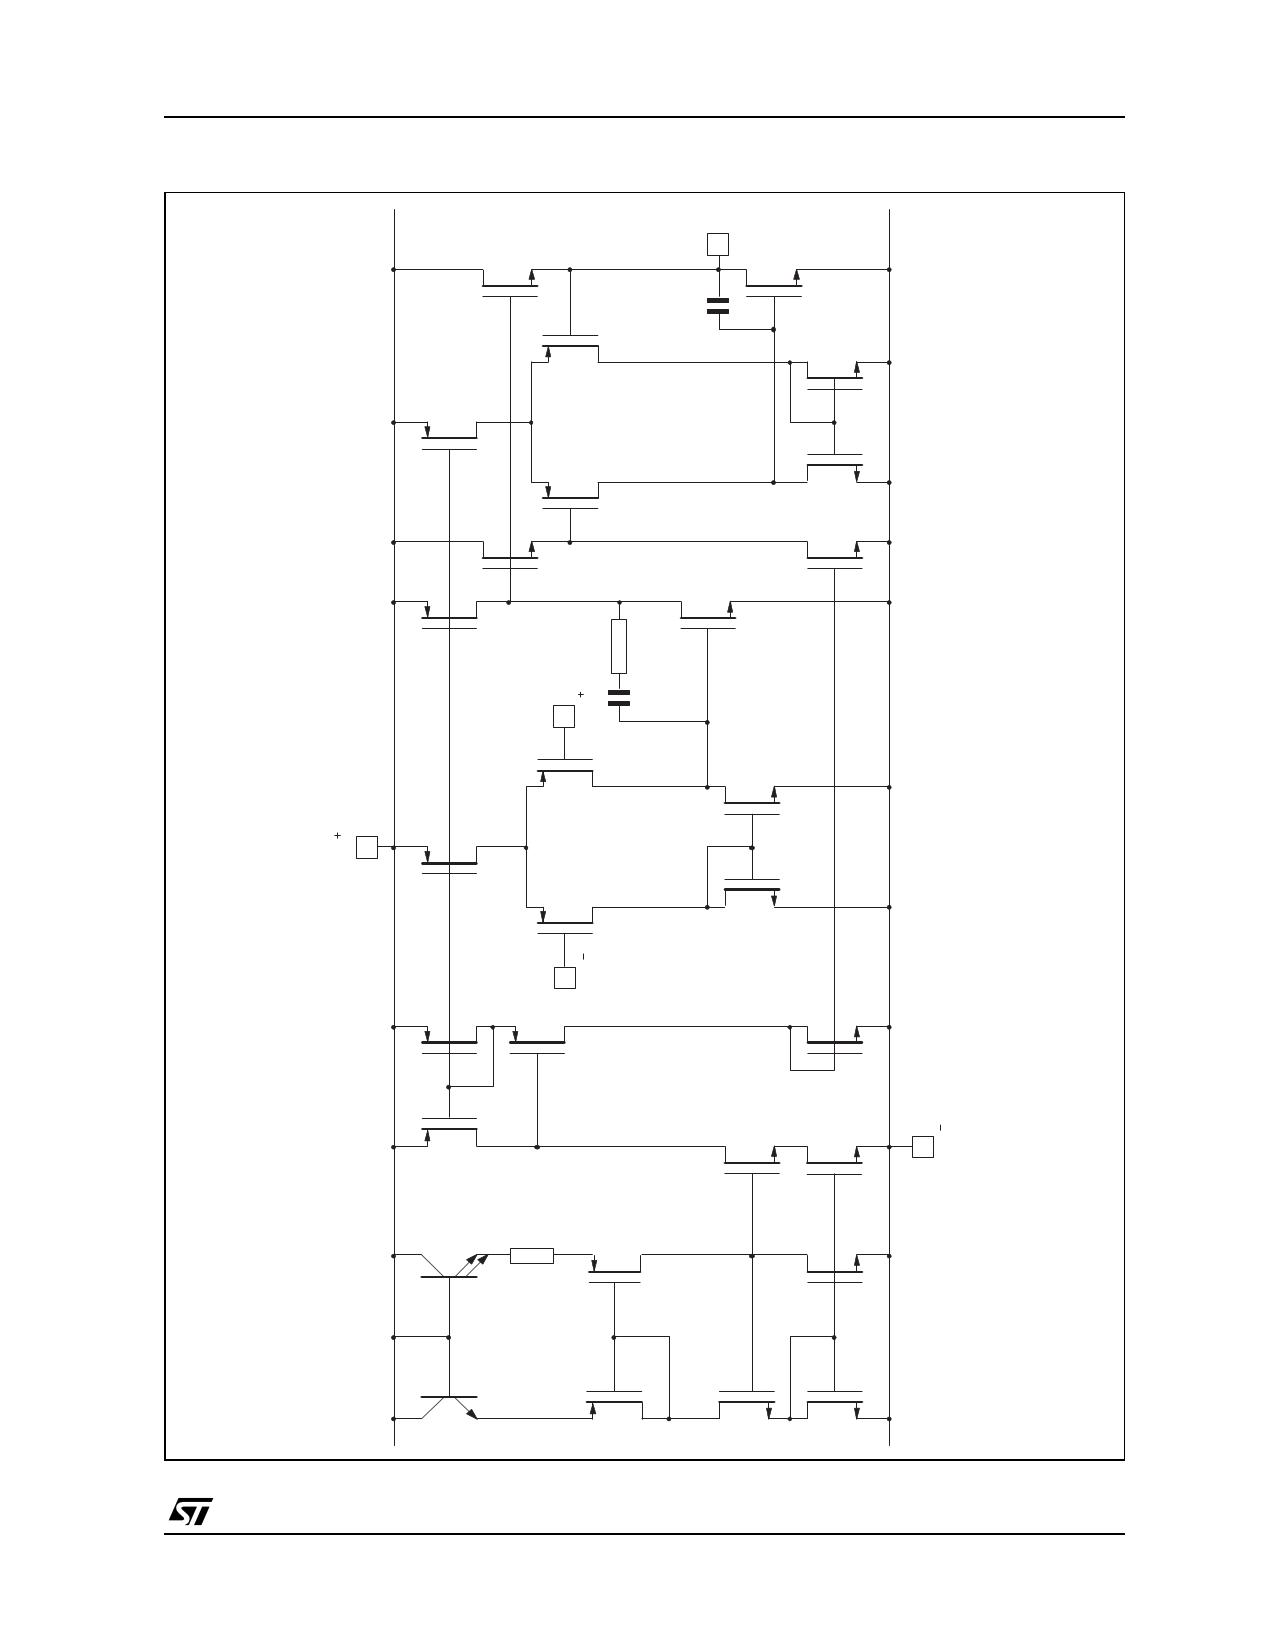 TS27M4BI pdf, ピン配列